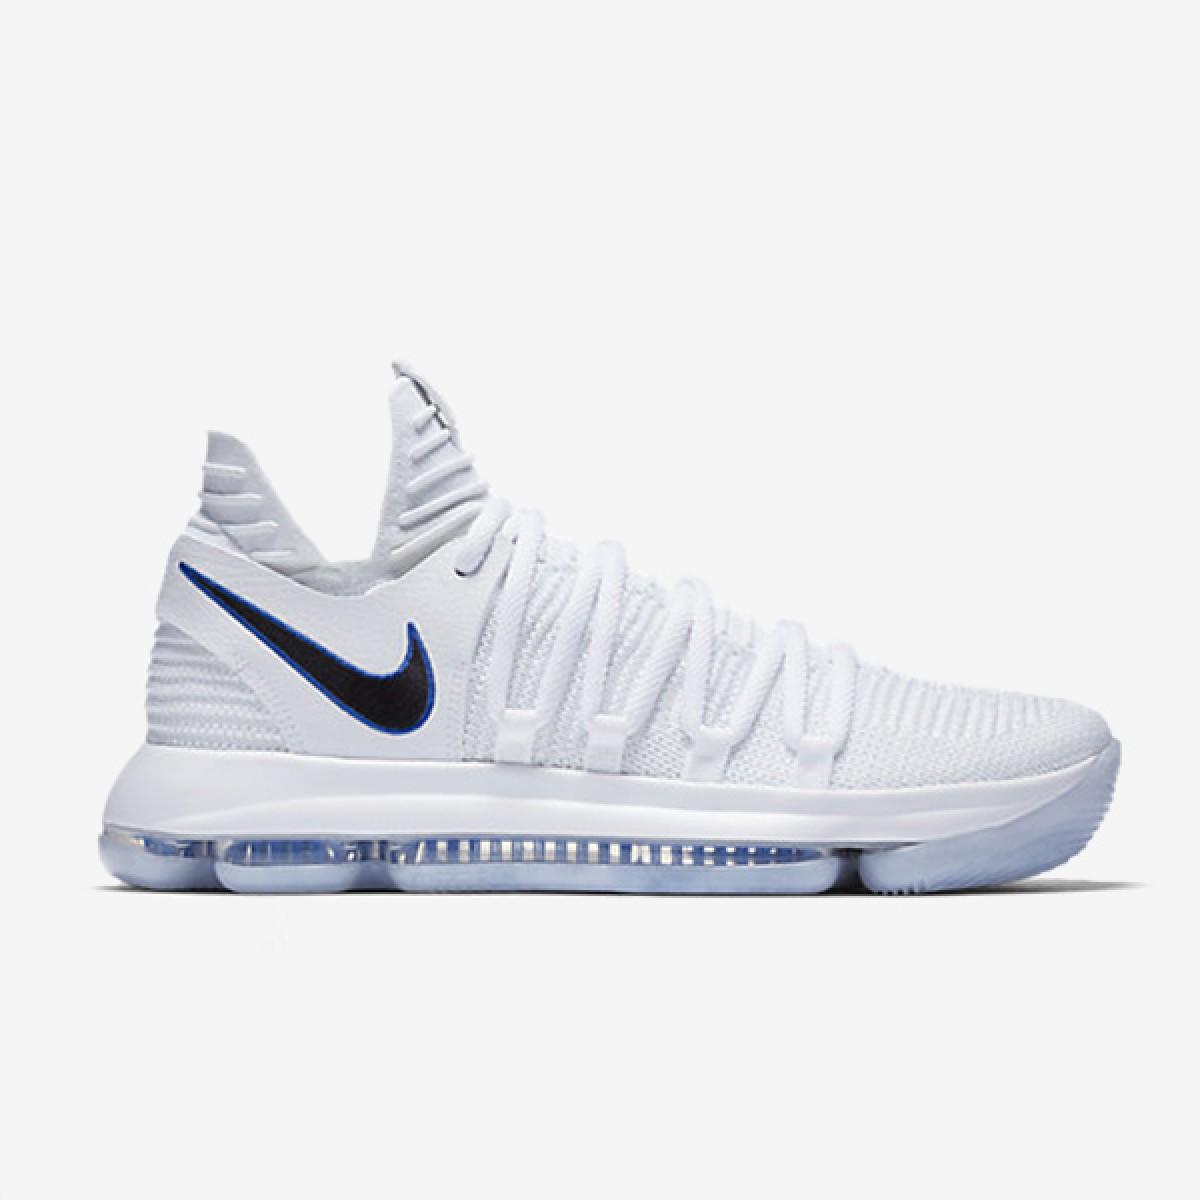 Nike Zoom KD 10 'Opening Night'